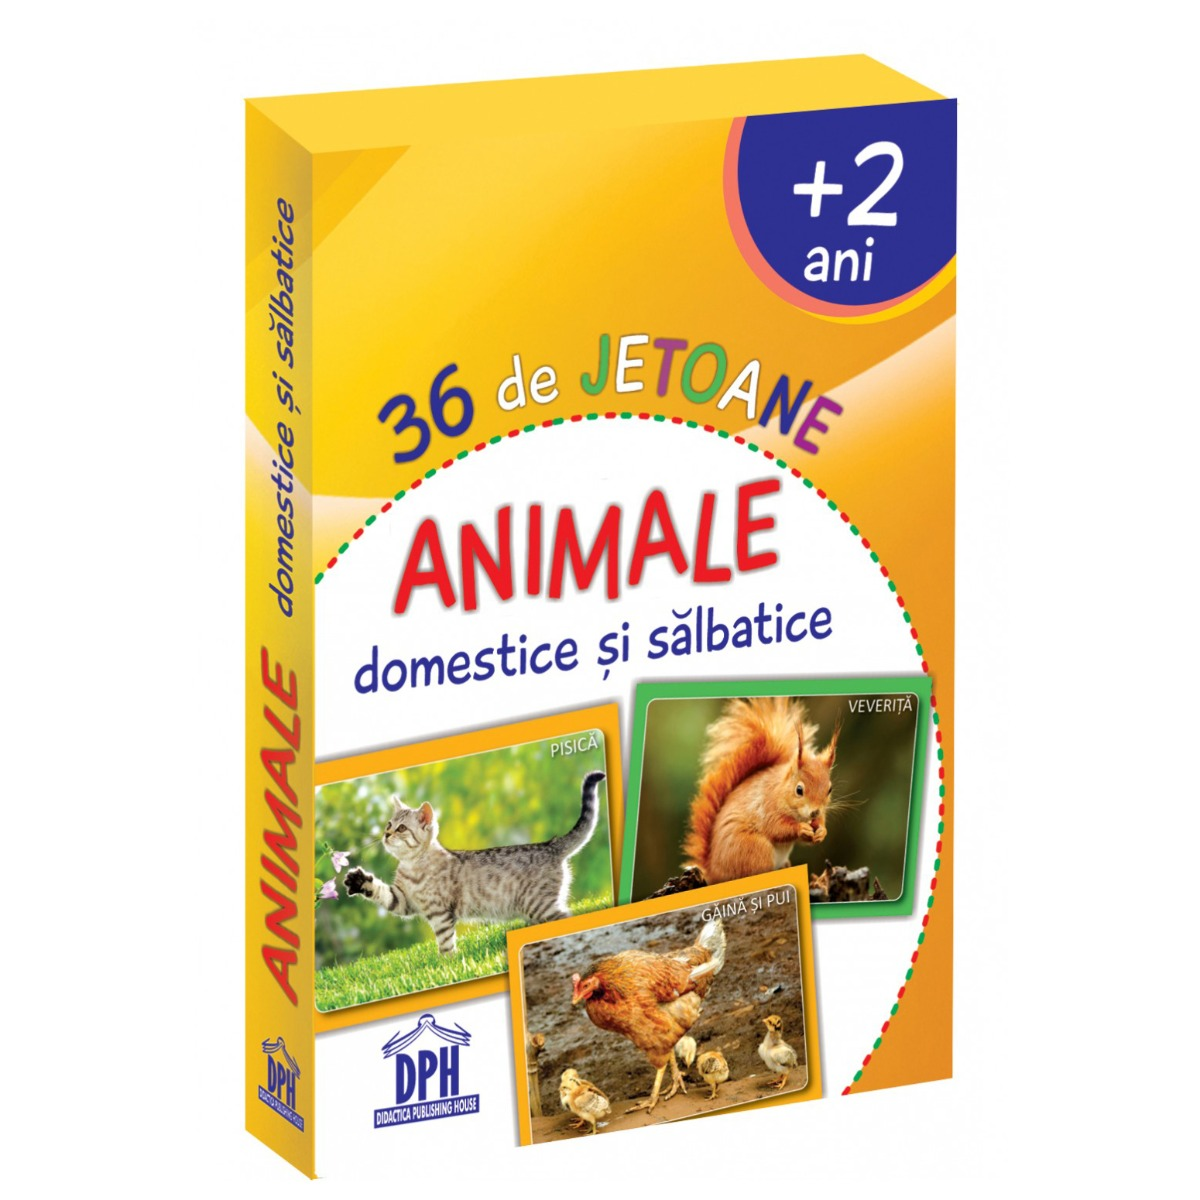 Animale domestice si salbatice, 36 jetoane, Editura DPH